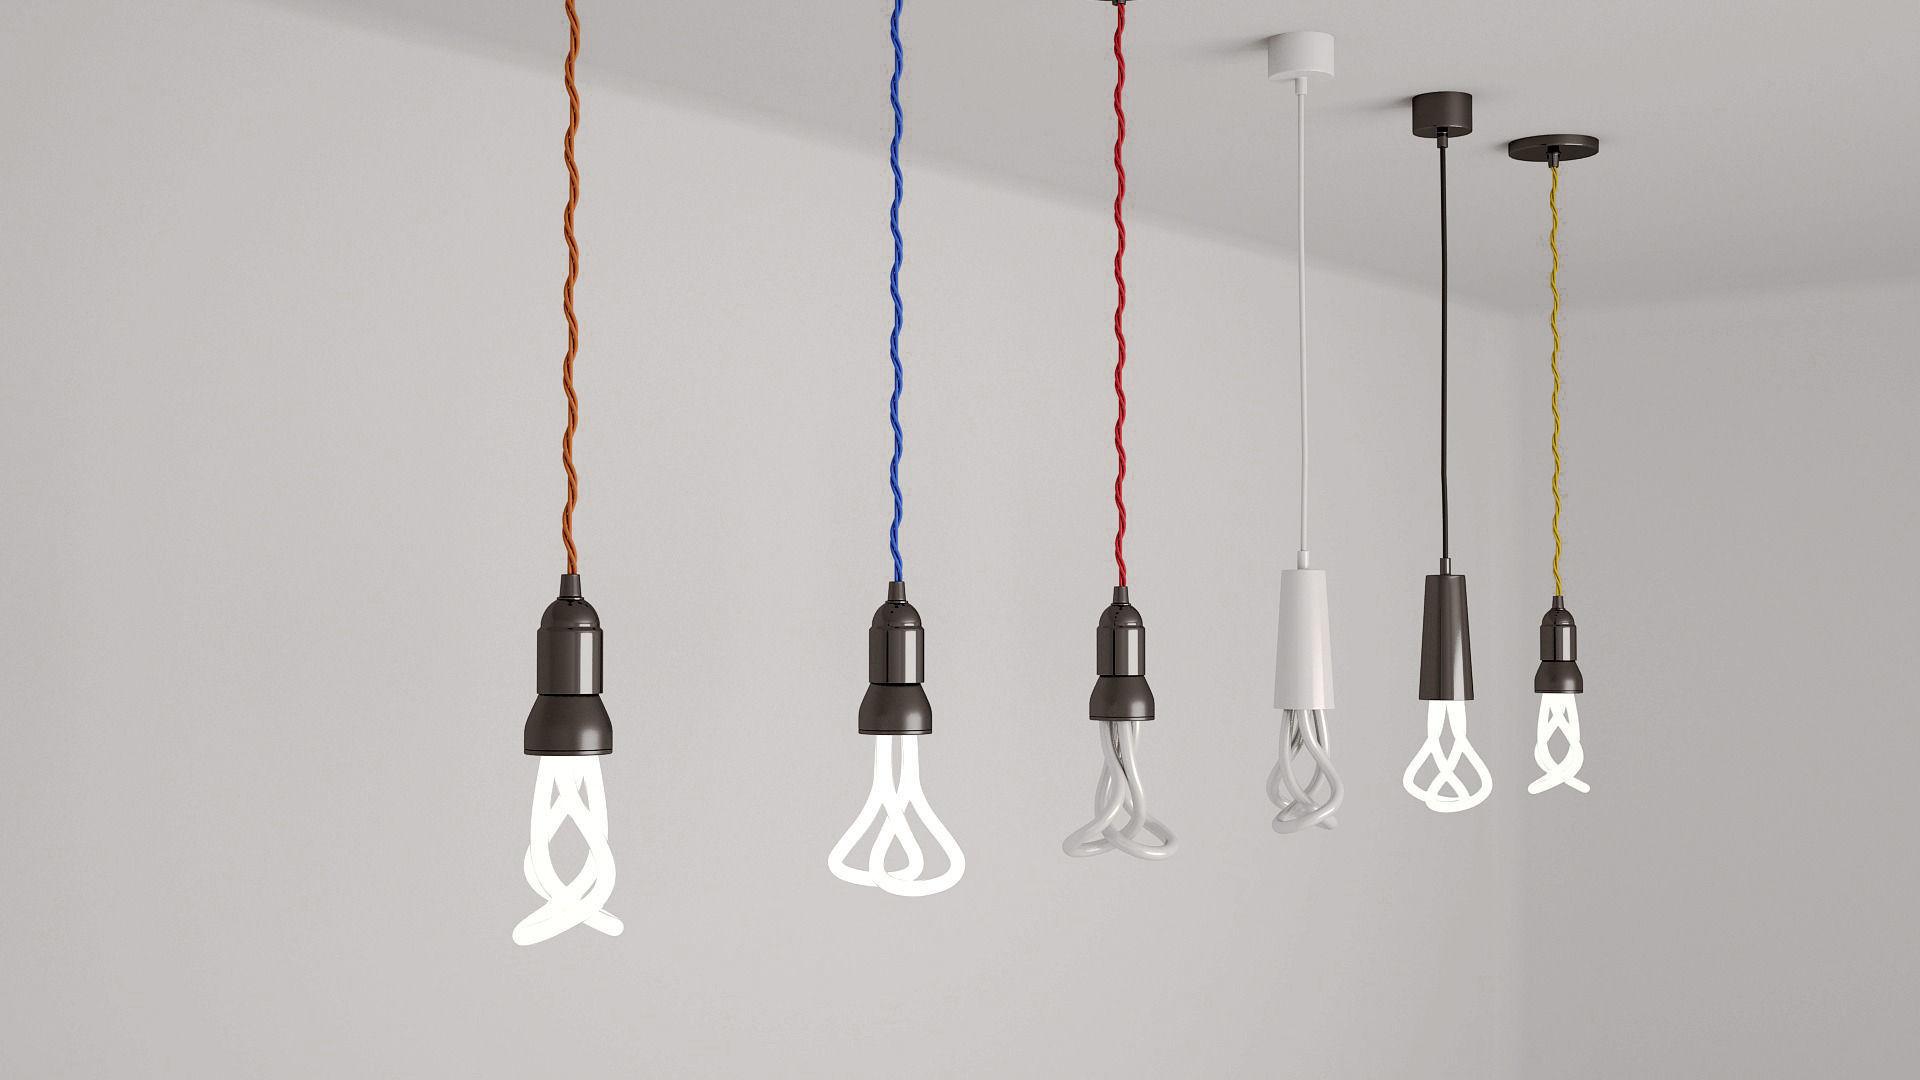 pendant light bulbs 3d model max obj fbx 1 ...  sc 1 st  CGTrader.com & 3D model Pendant Light bulbs | CGTrader azcodes.com